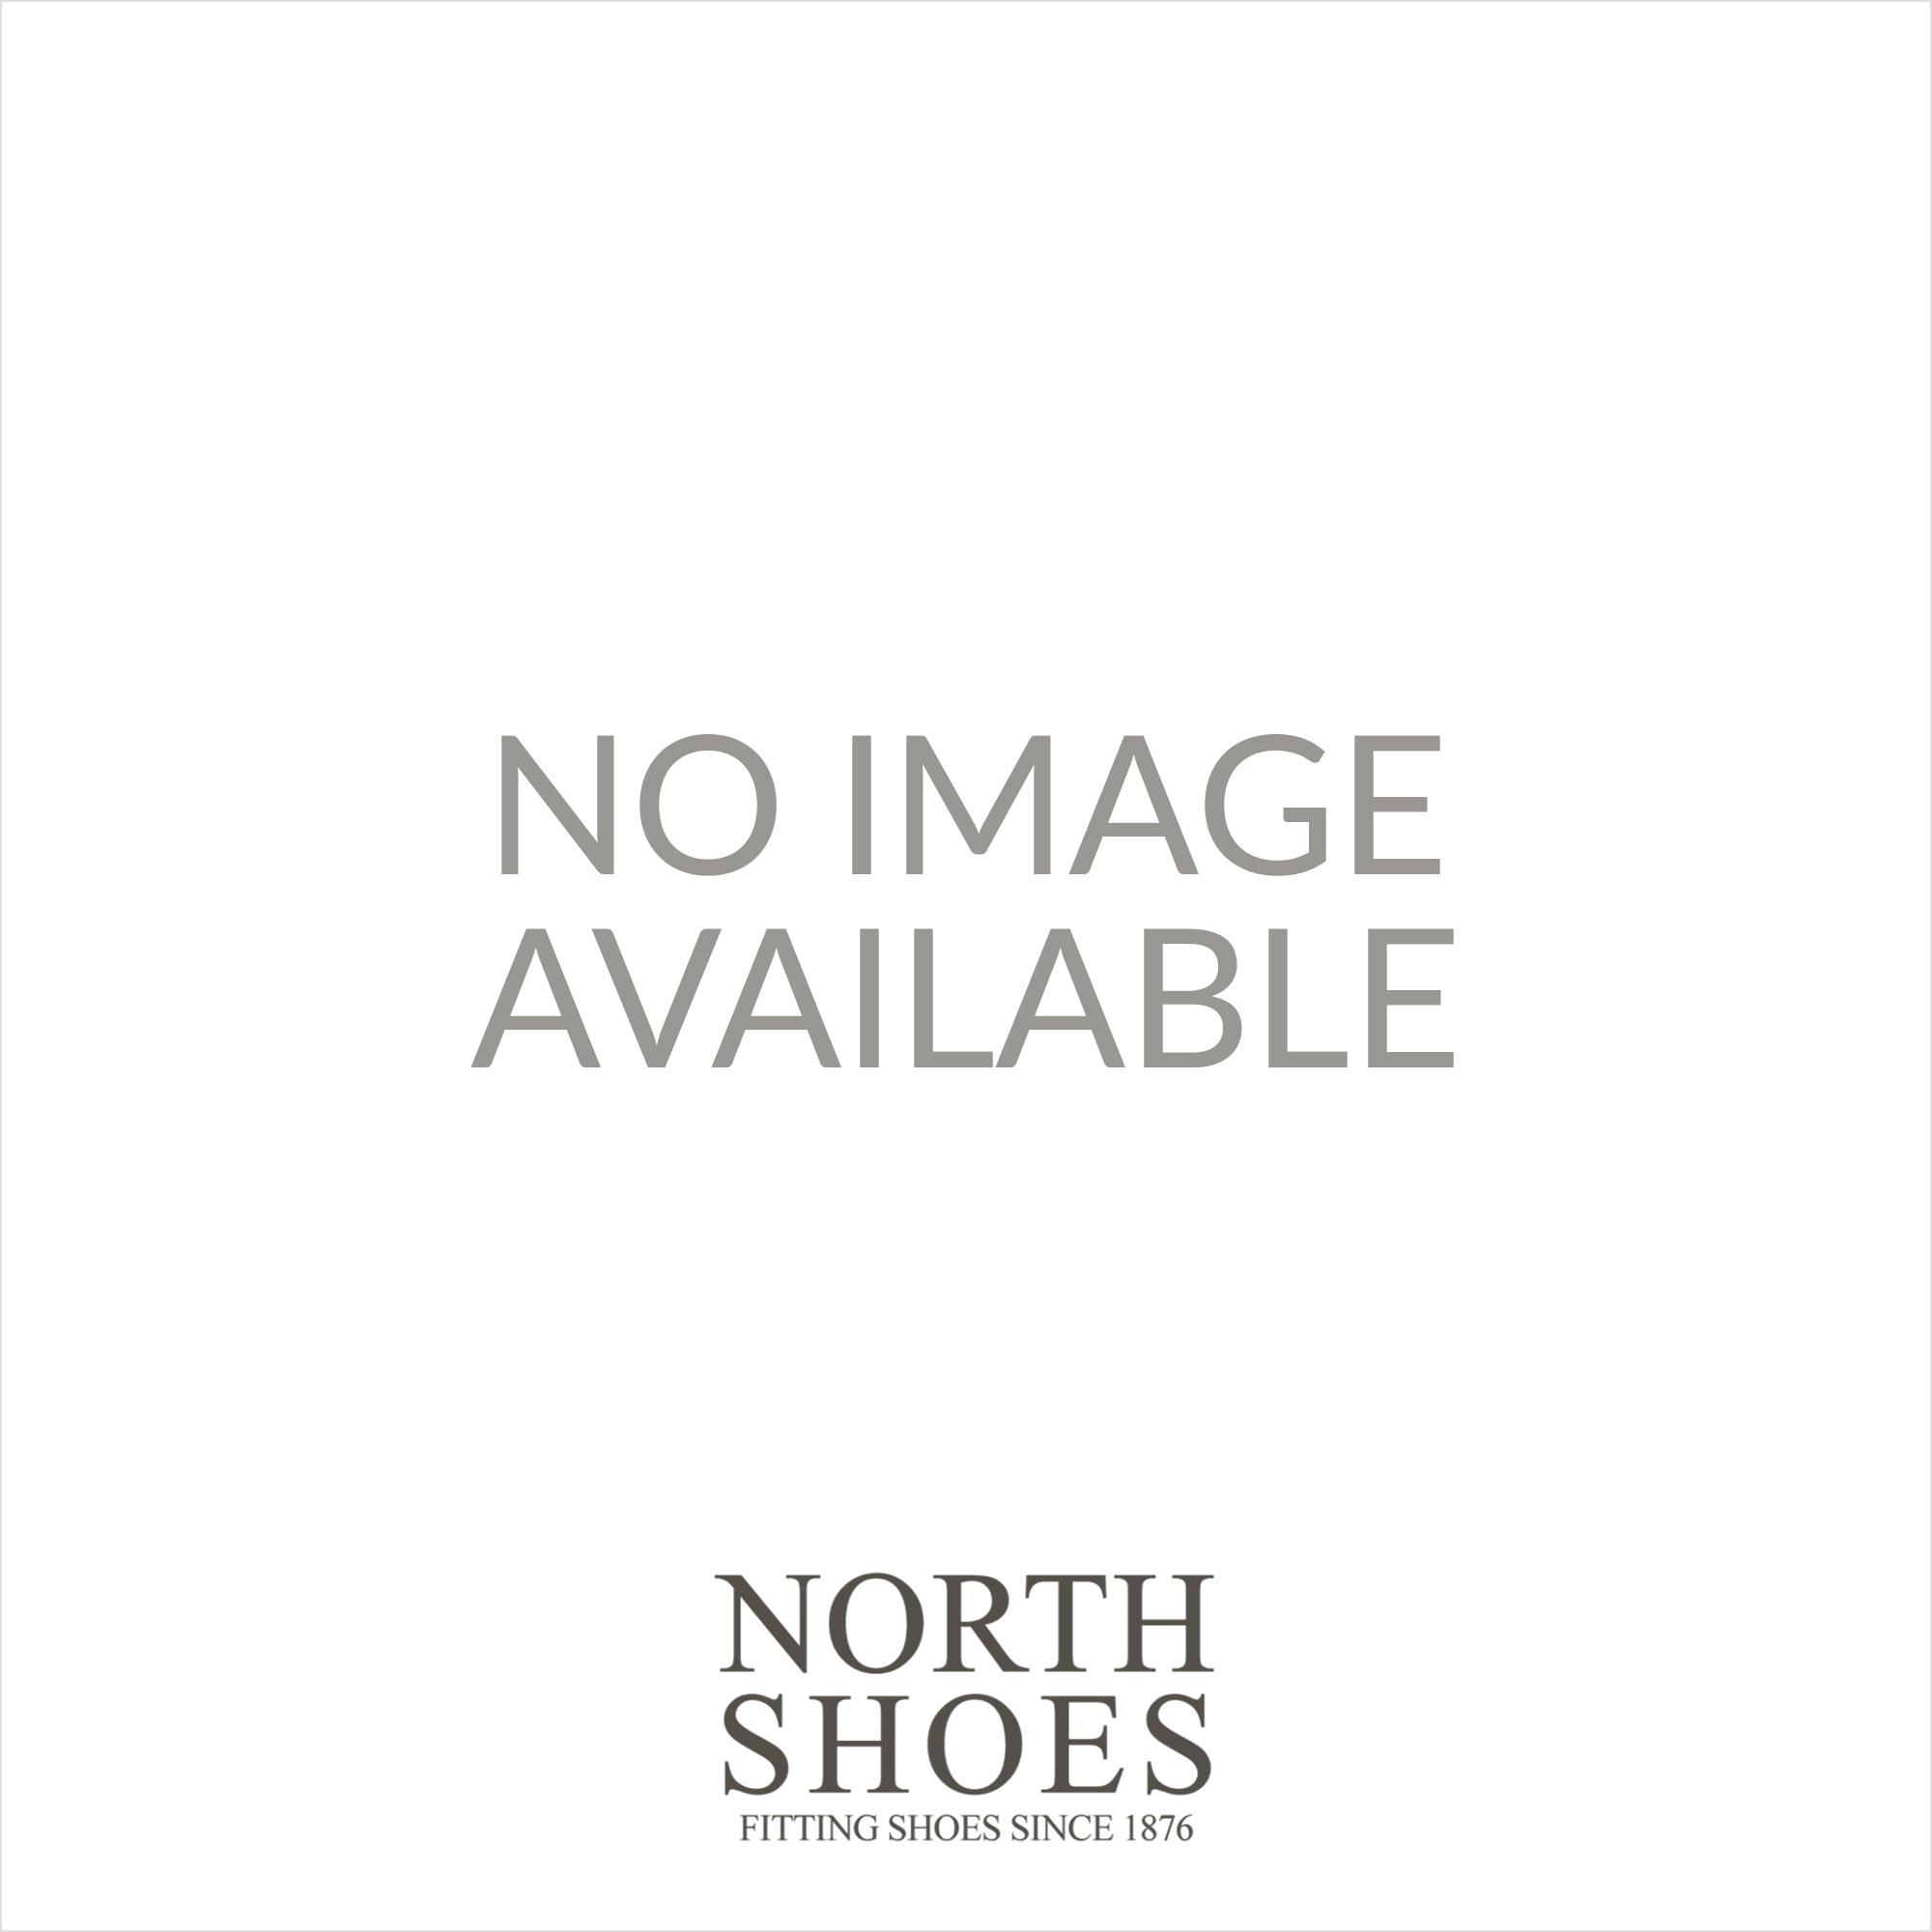 Award Blaze Infant Yellow Neon Boys Astro Turf Sports Trainer Shoe